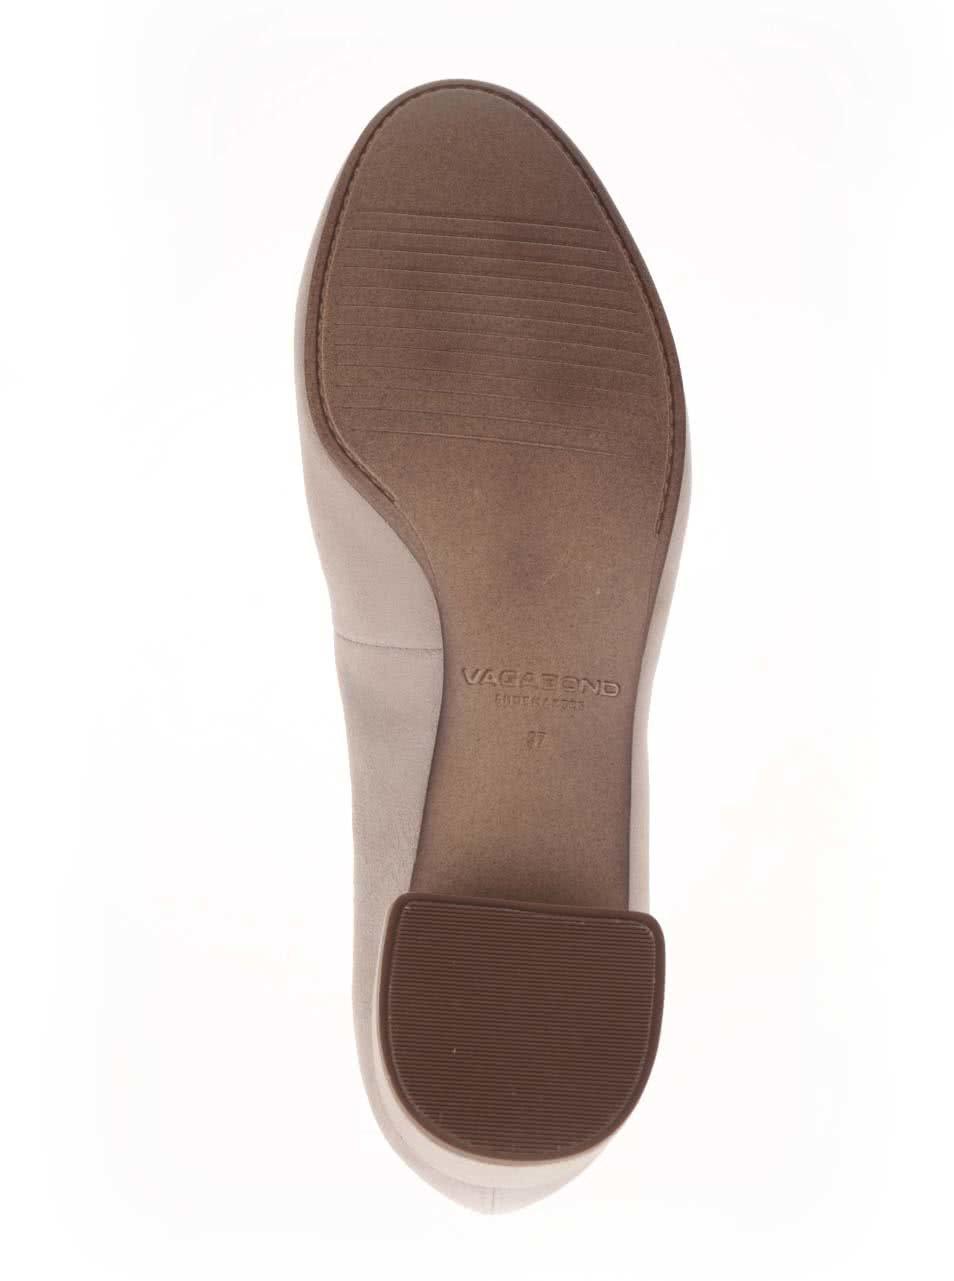 0144f561fb18 Béžové dámske topánky na podpätku Vagabond Jamilla ...